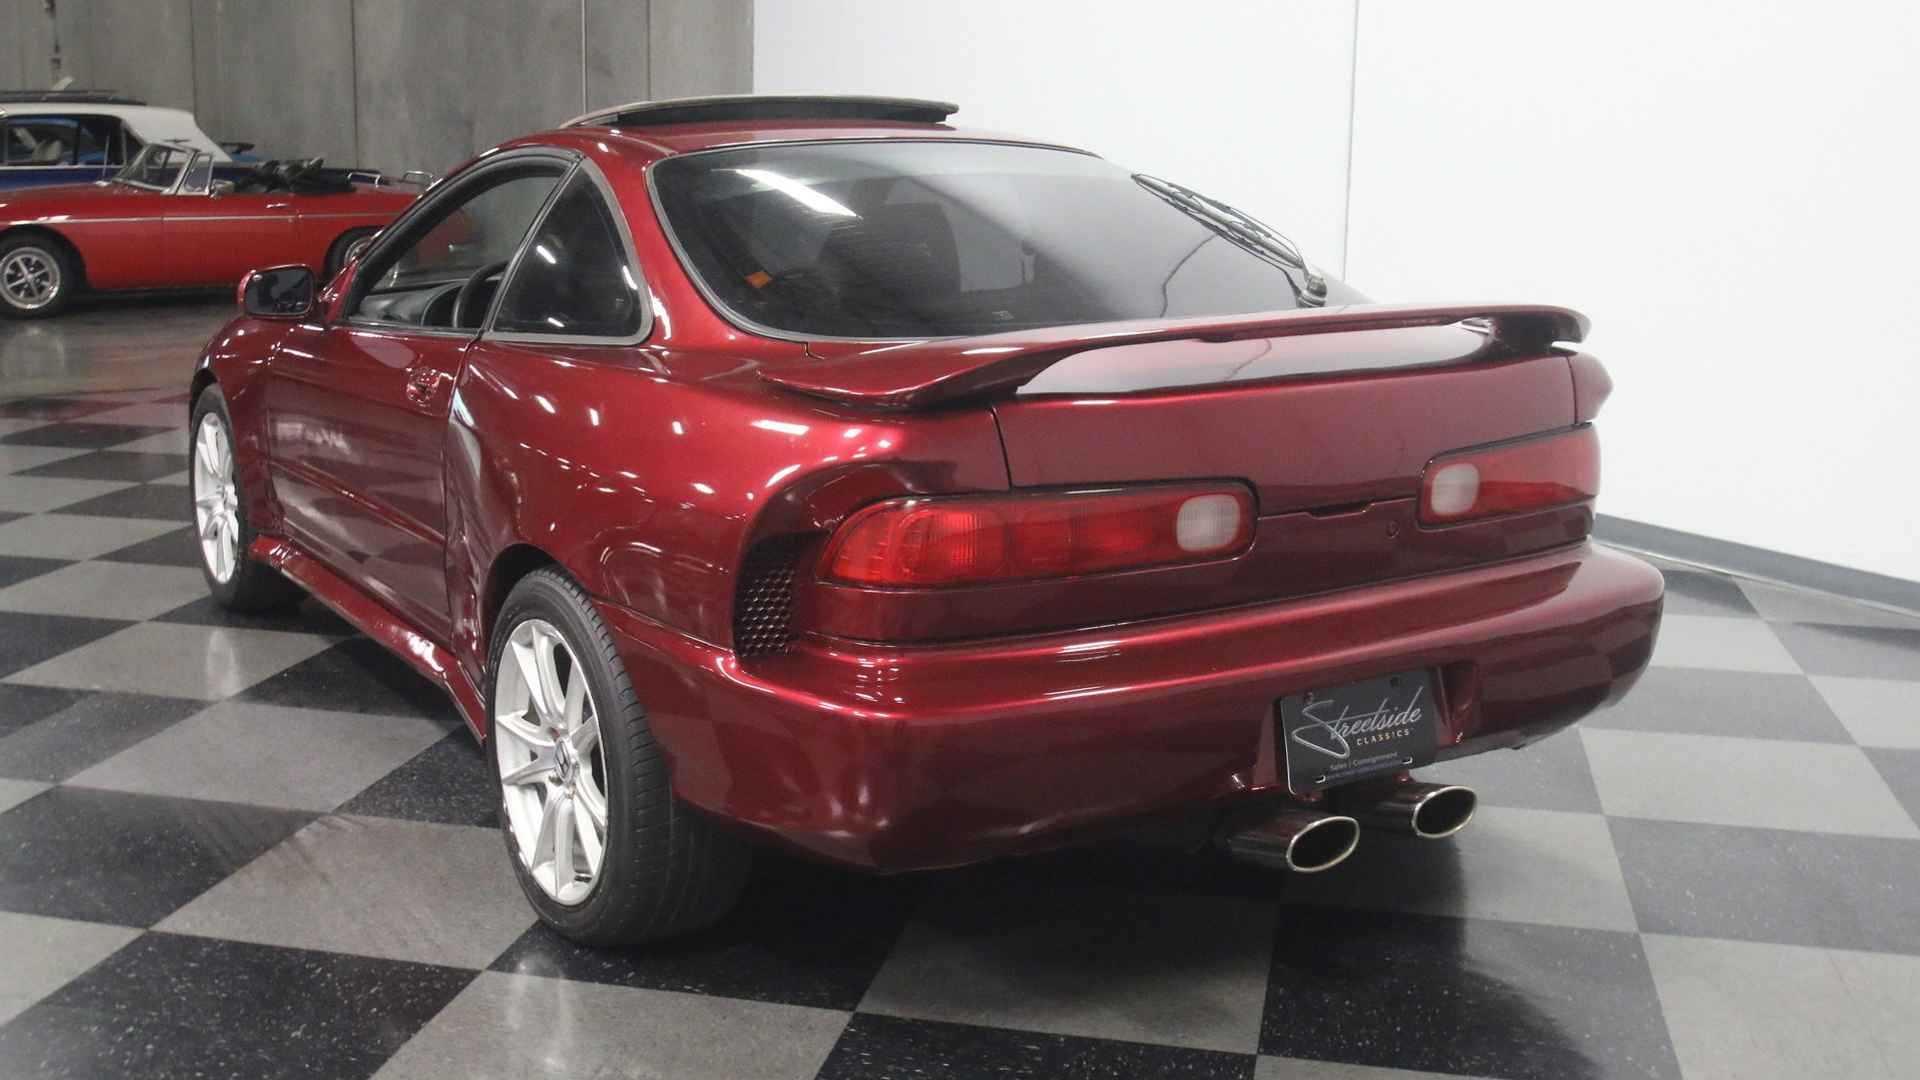 Go Crazy, Buy This 8 2L Twin-Turbo V8-Powered RWD Acura Integra